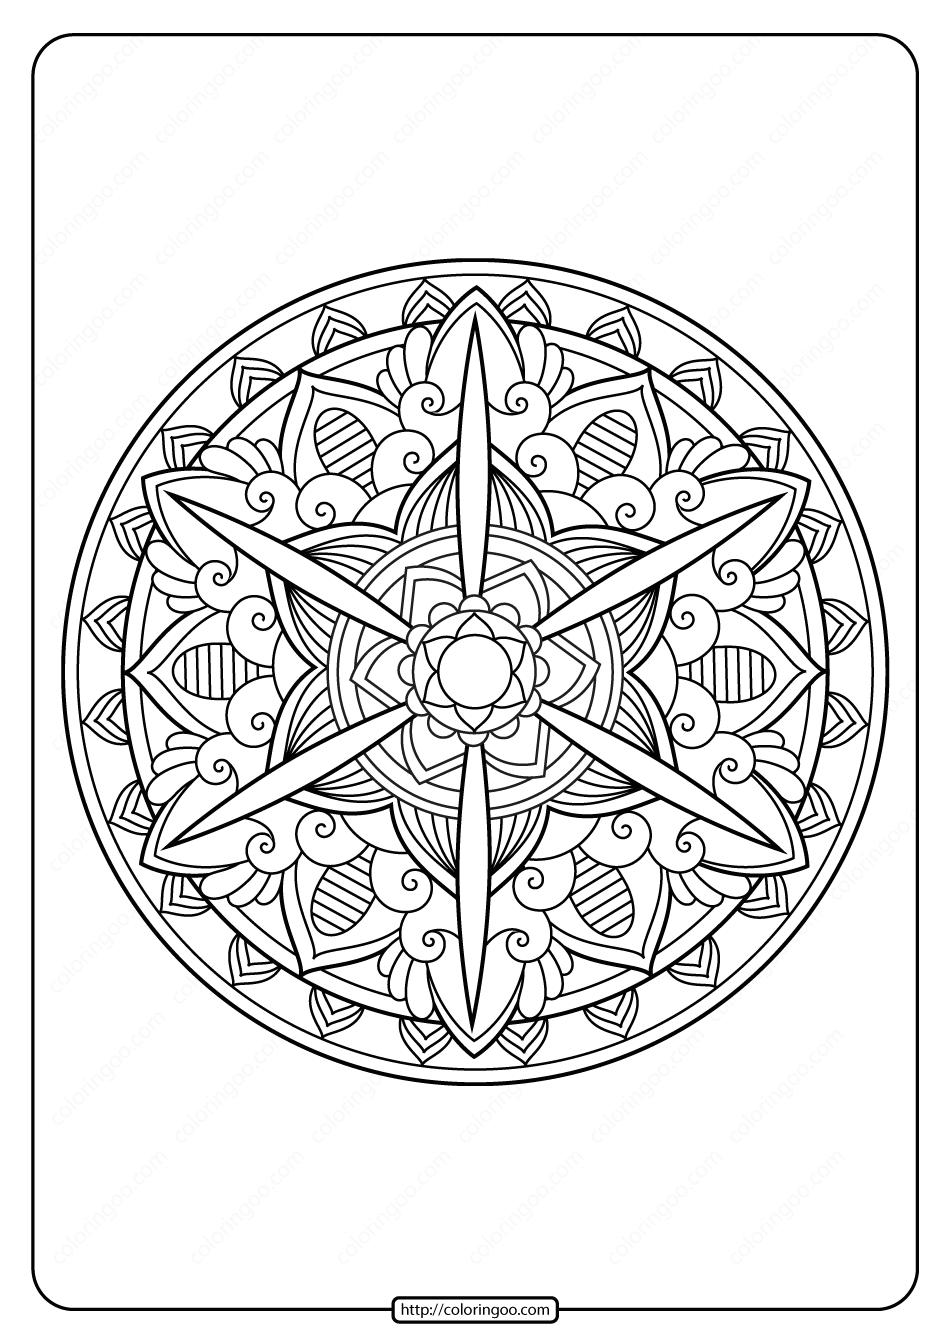 Free Printable Adult Floral Mandala Coloring Page 61